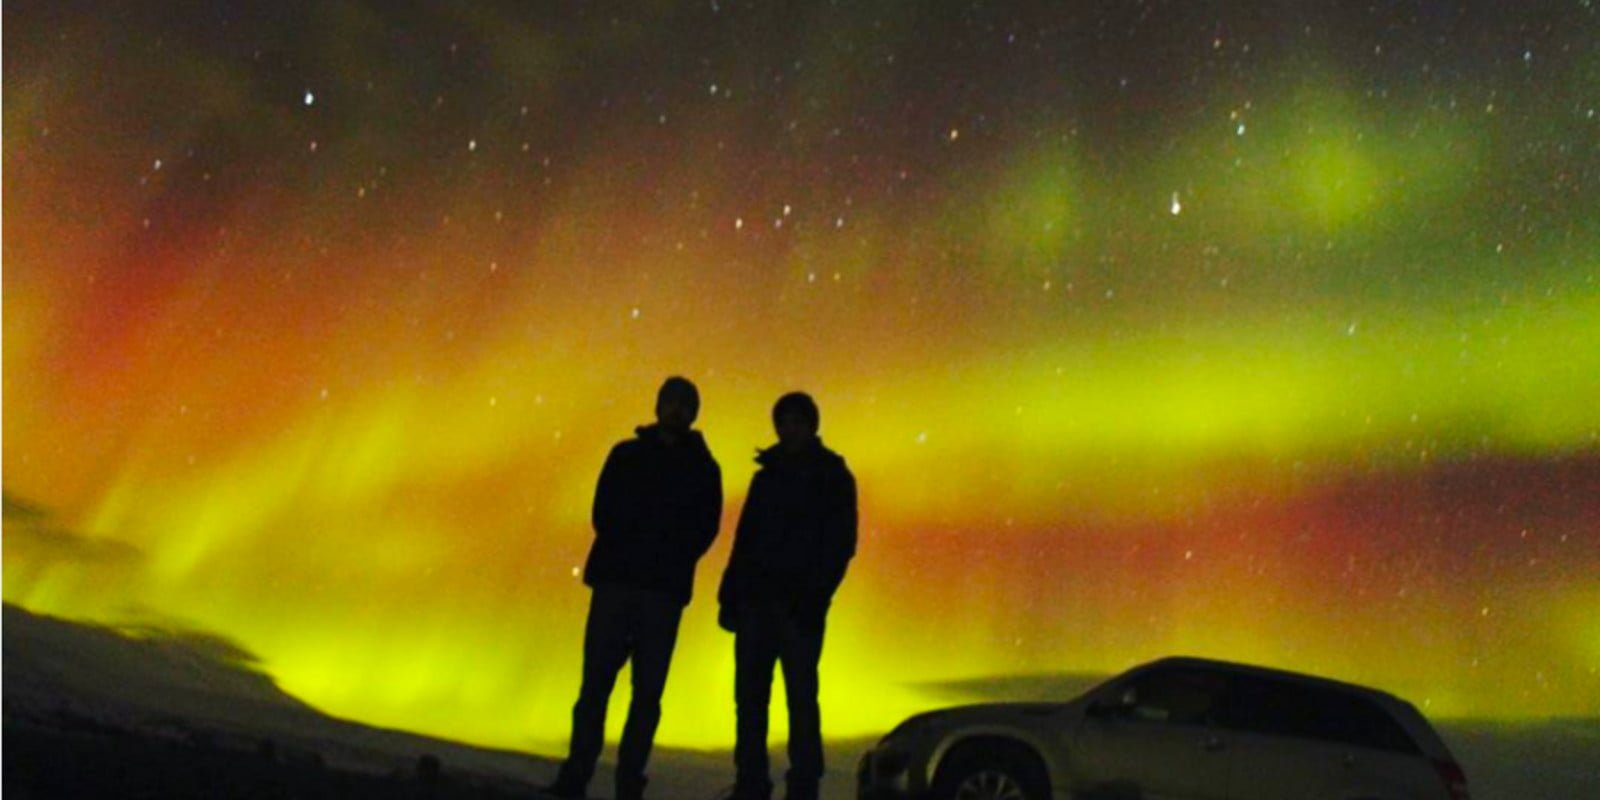 PHOTOS: Spectacular Aurora Display Last Night